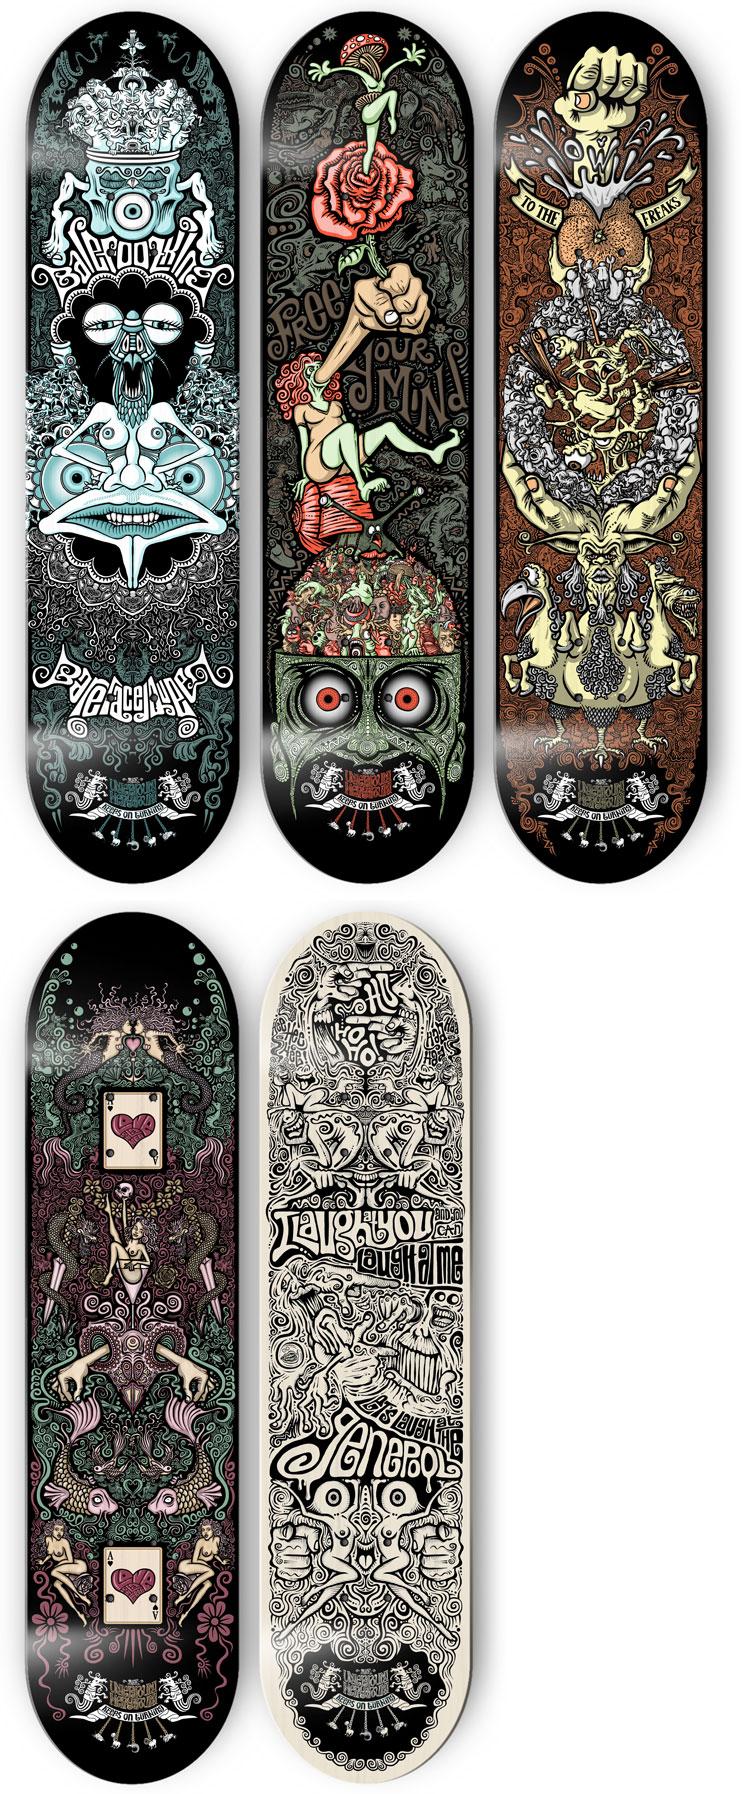 The U.M. decks